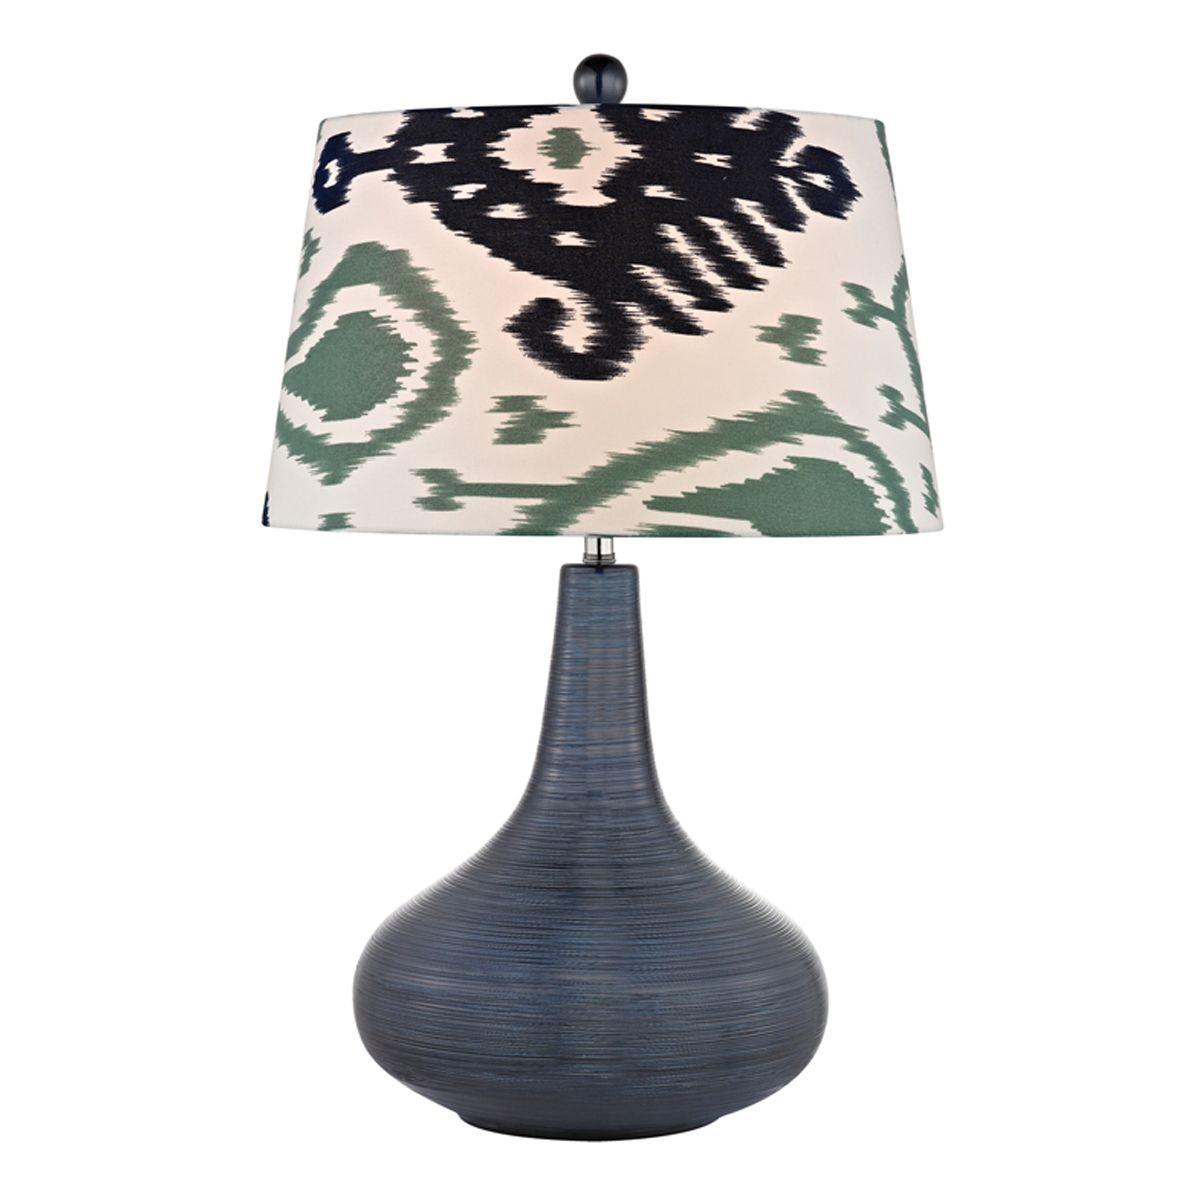 Dm D2520 Lamp Ceramic Table Lamps Led Table Lamp